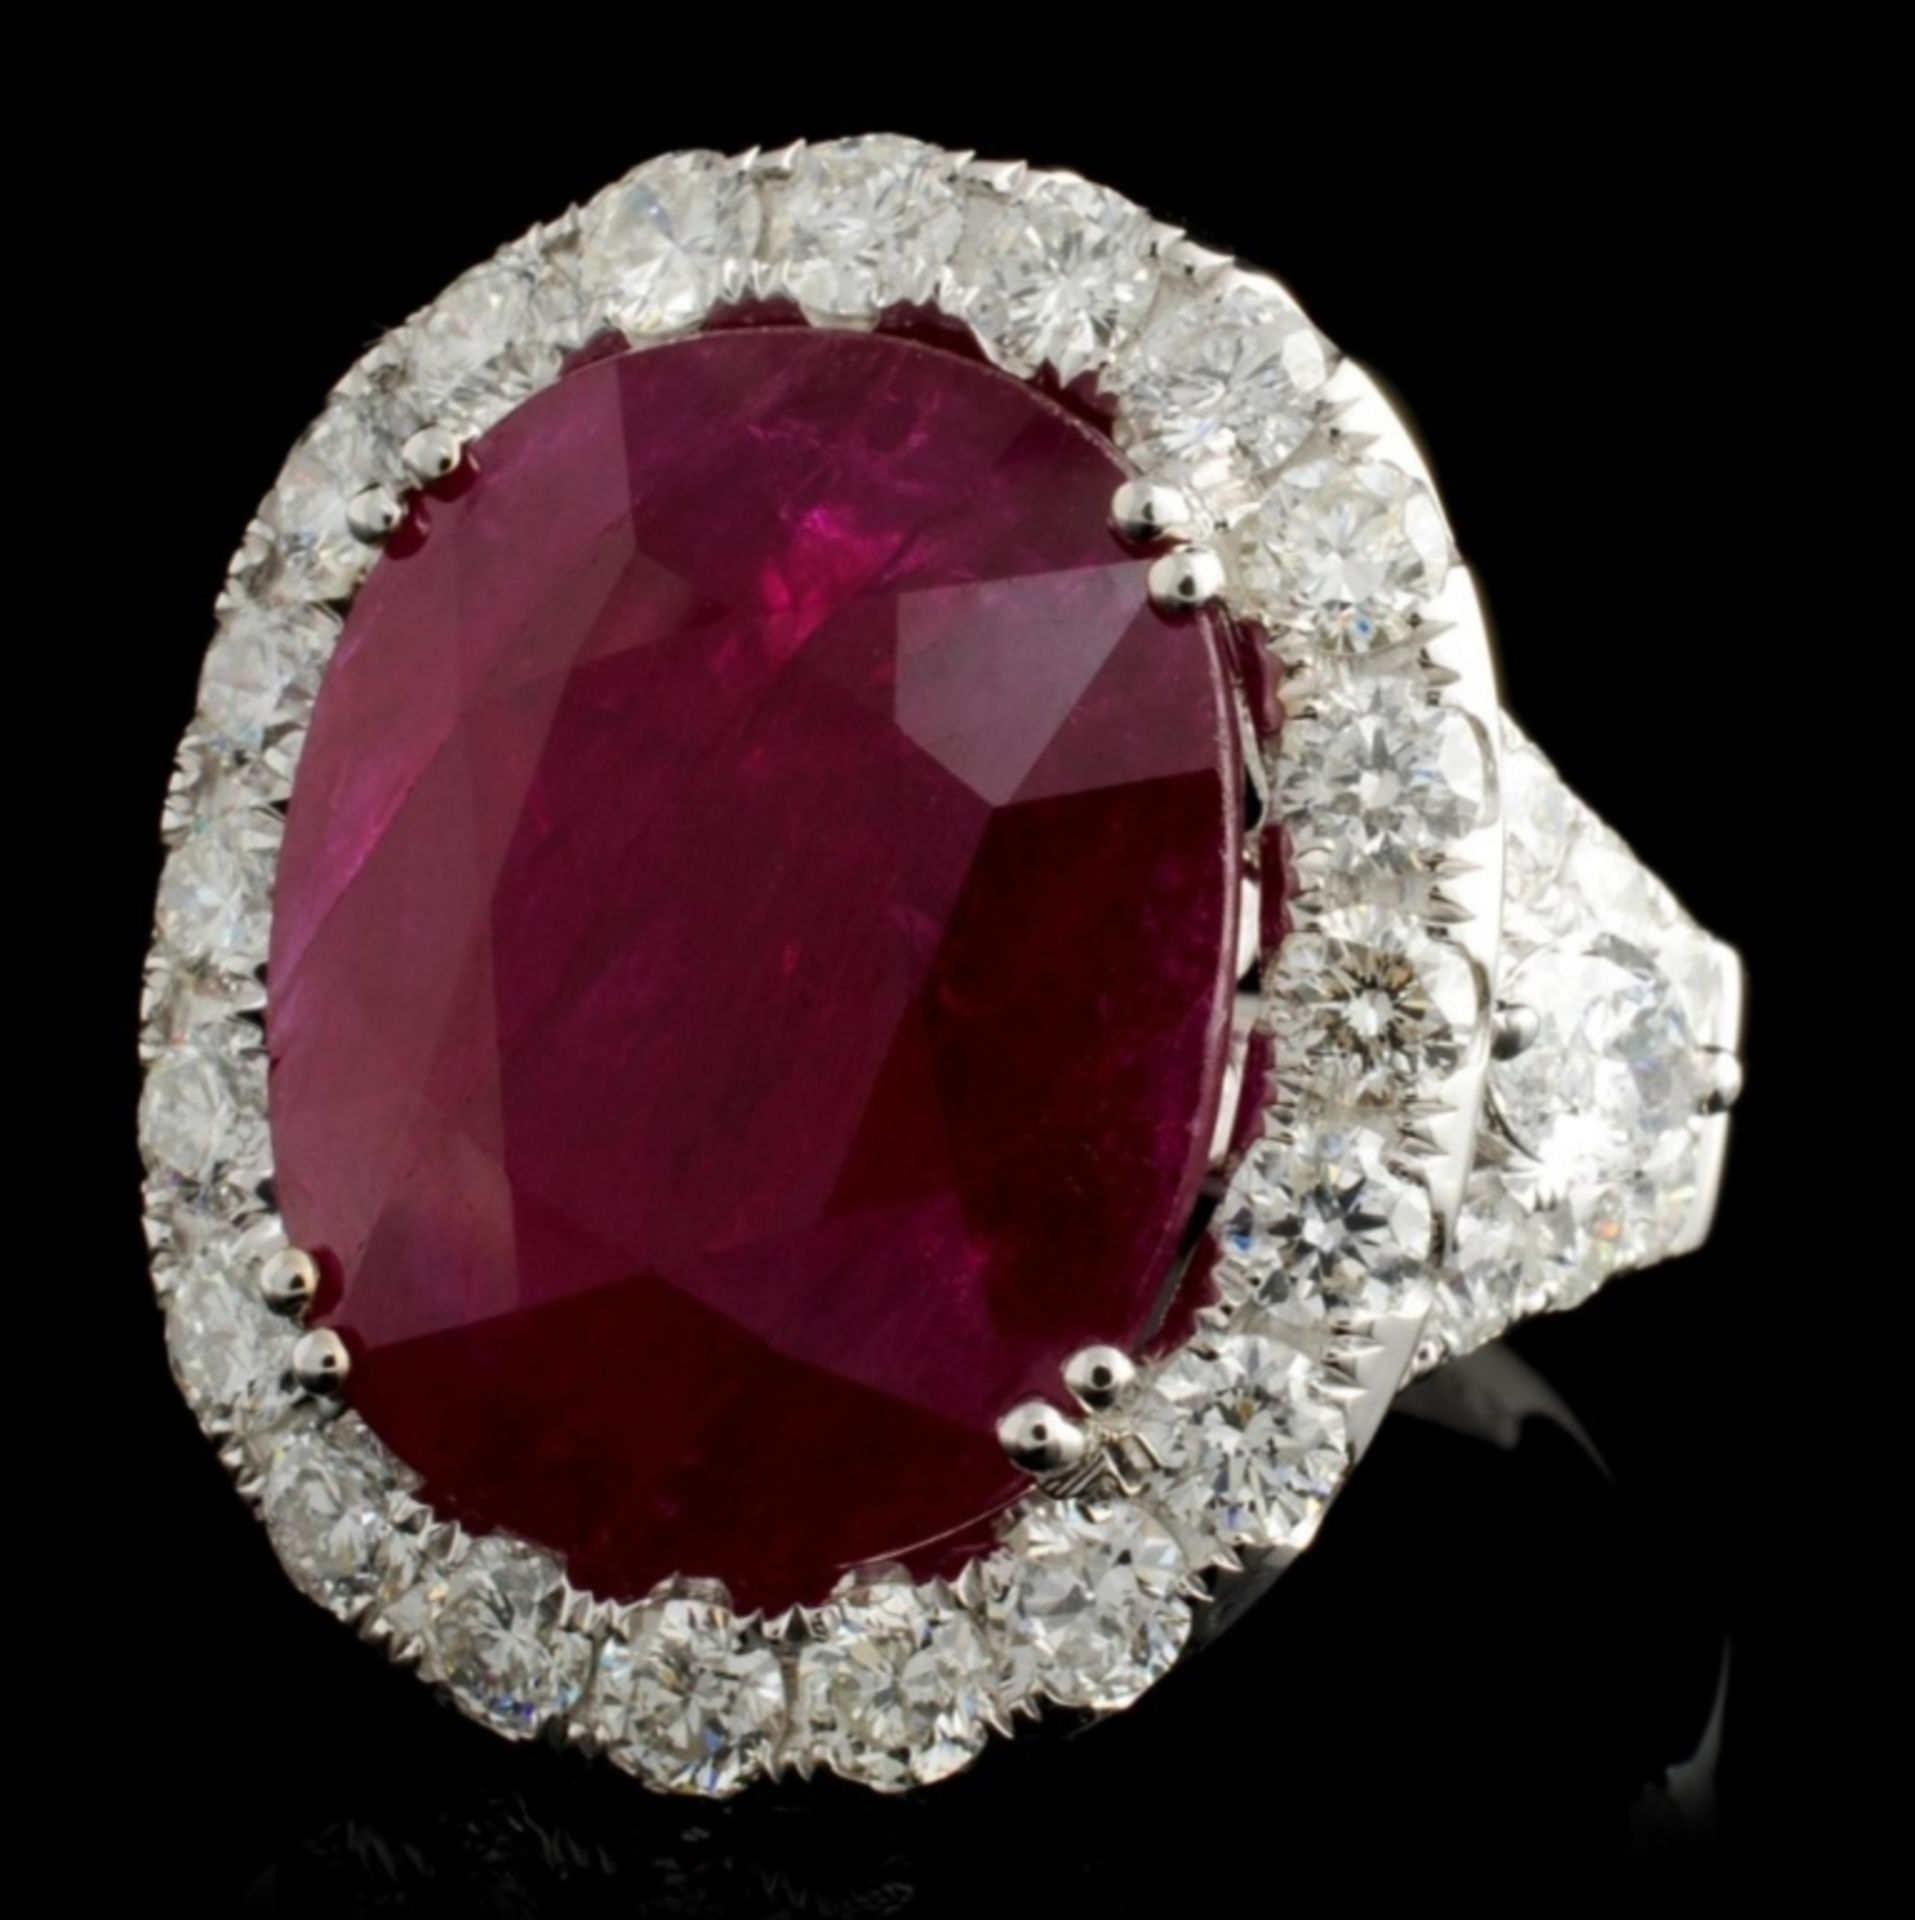 18K White Gold 15.55ct Ruby & 3.34ct Diamond Ring - Image 2 of 4